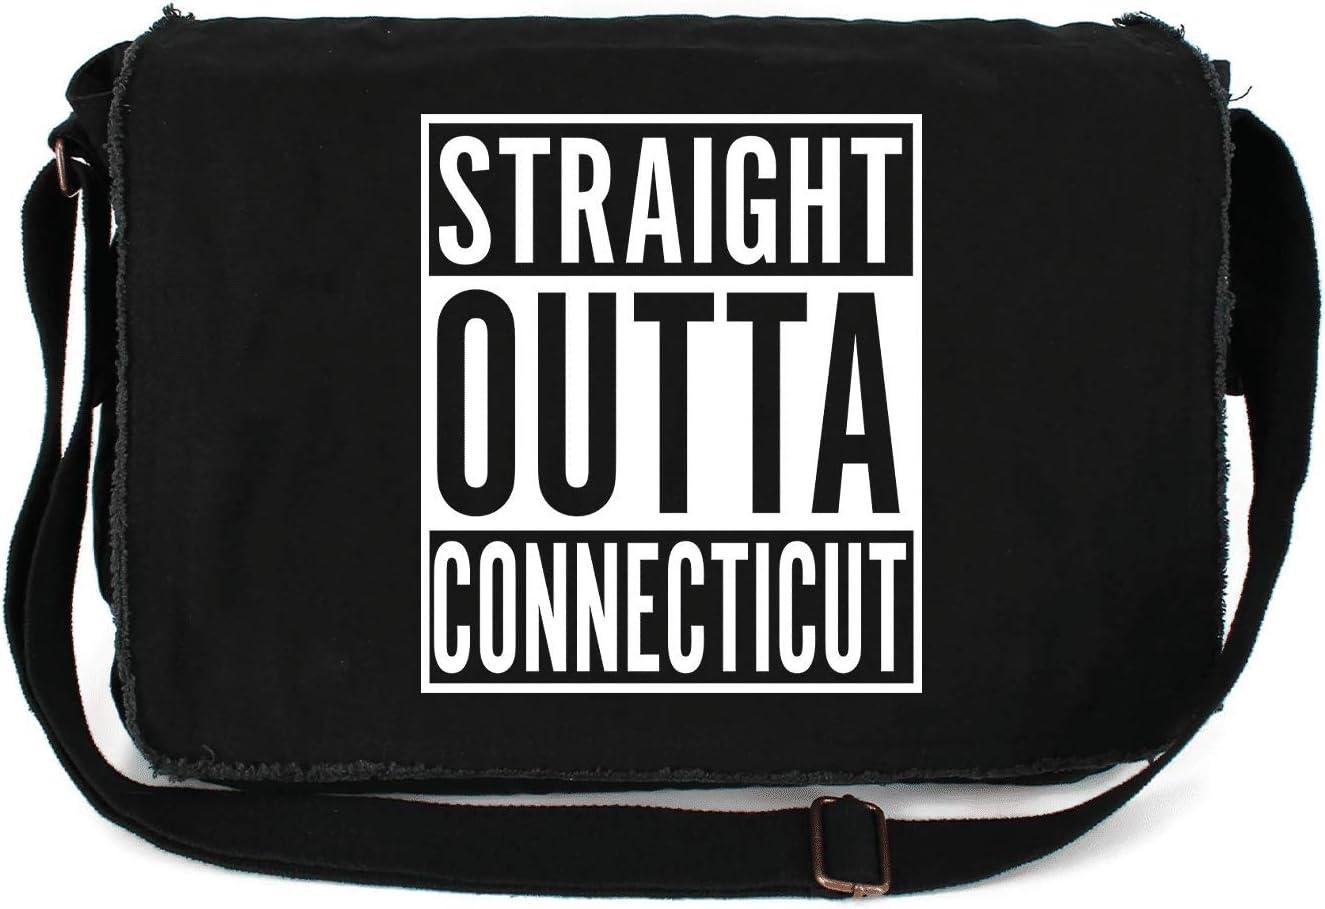 HARD EDGE DESIGN Straight New Daily bargain sale life Outta E Printed Custom Raw Connecticut